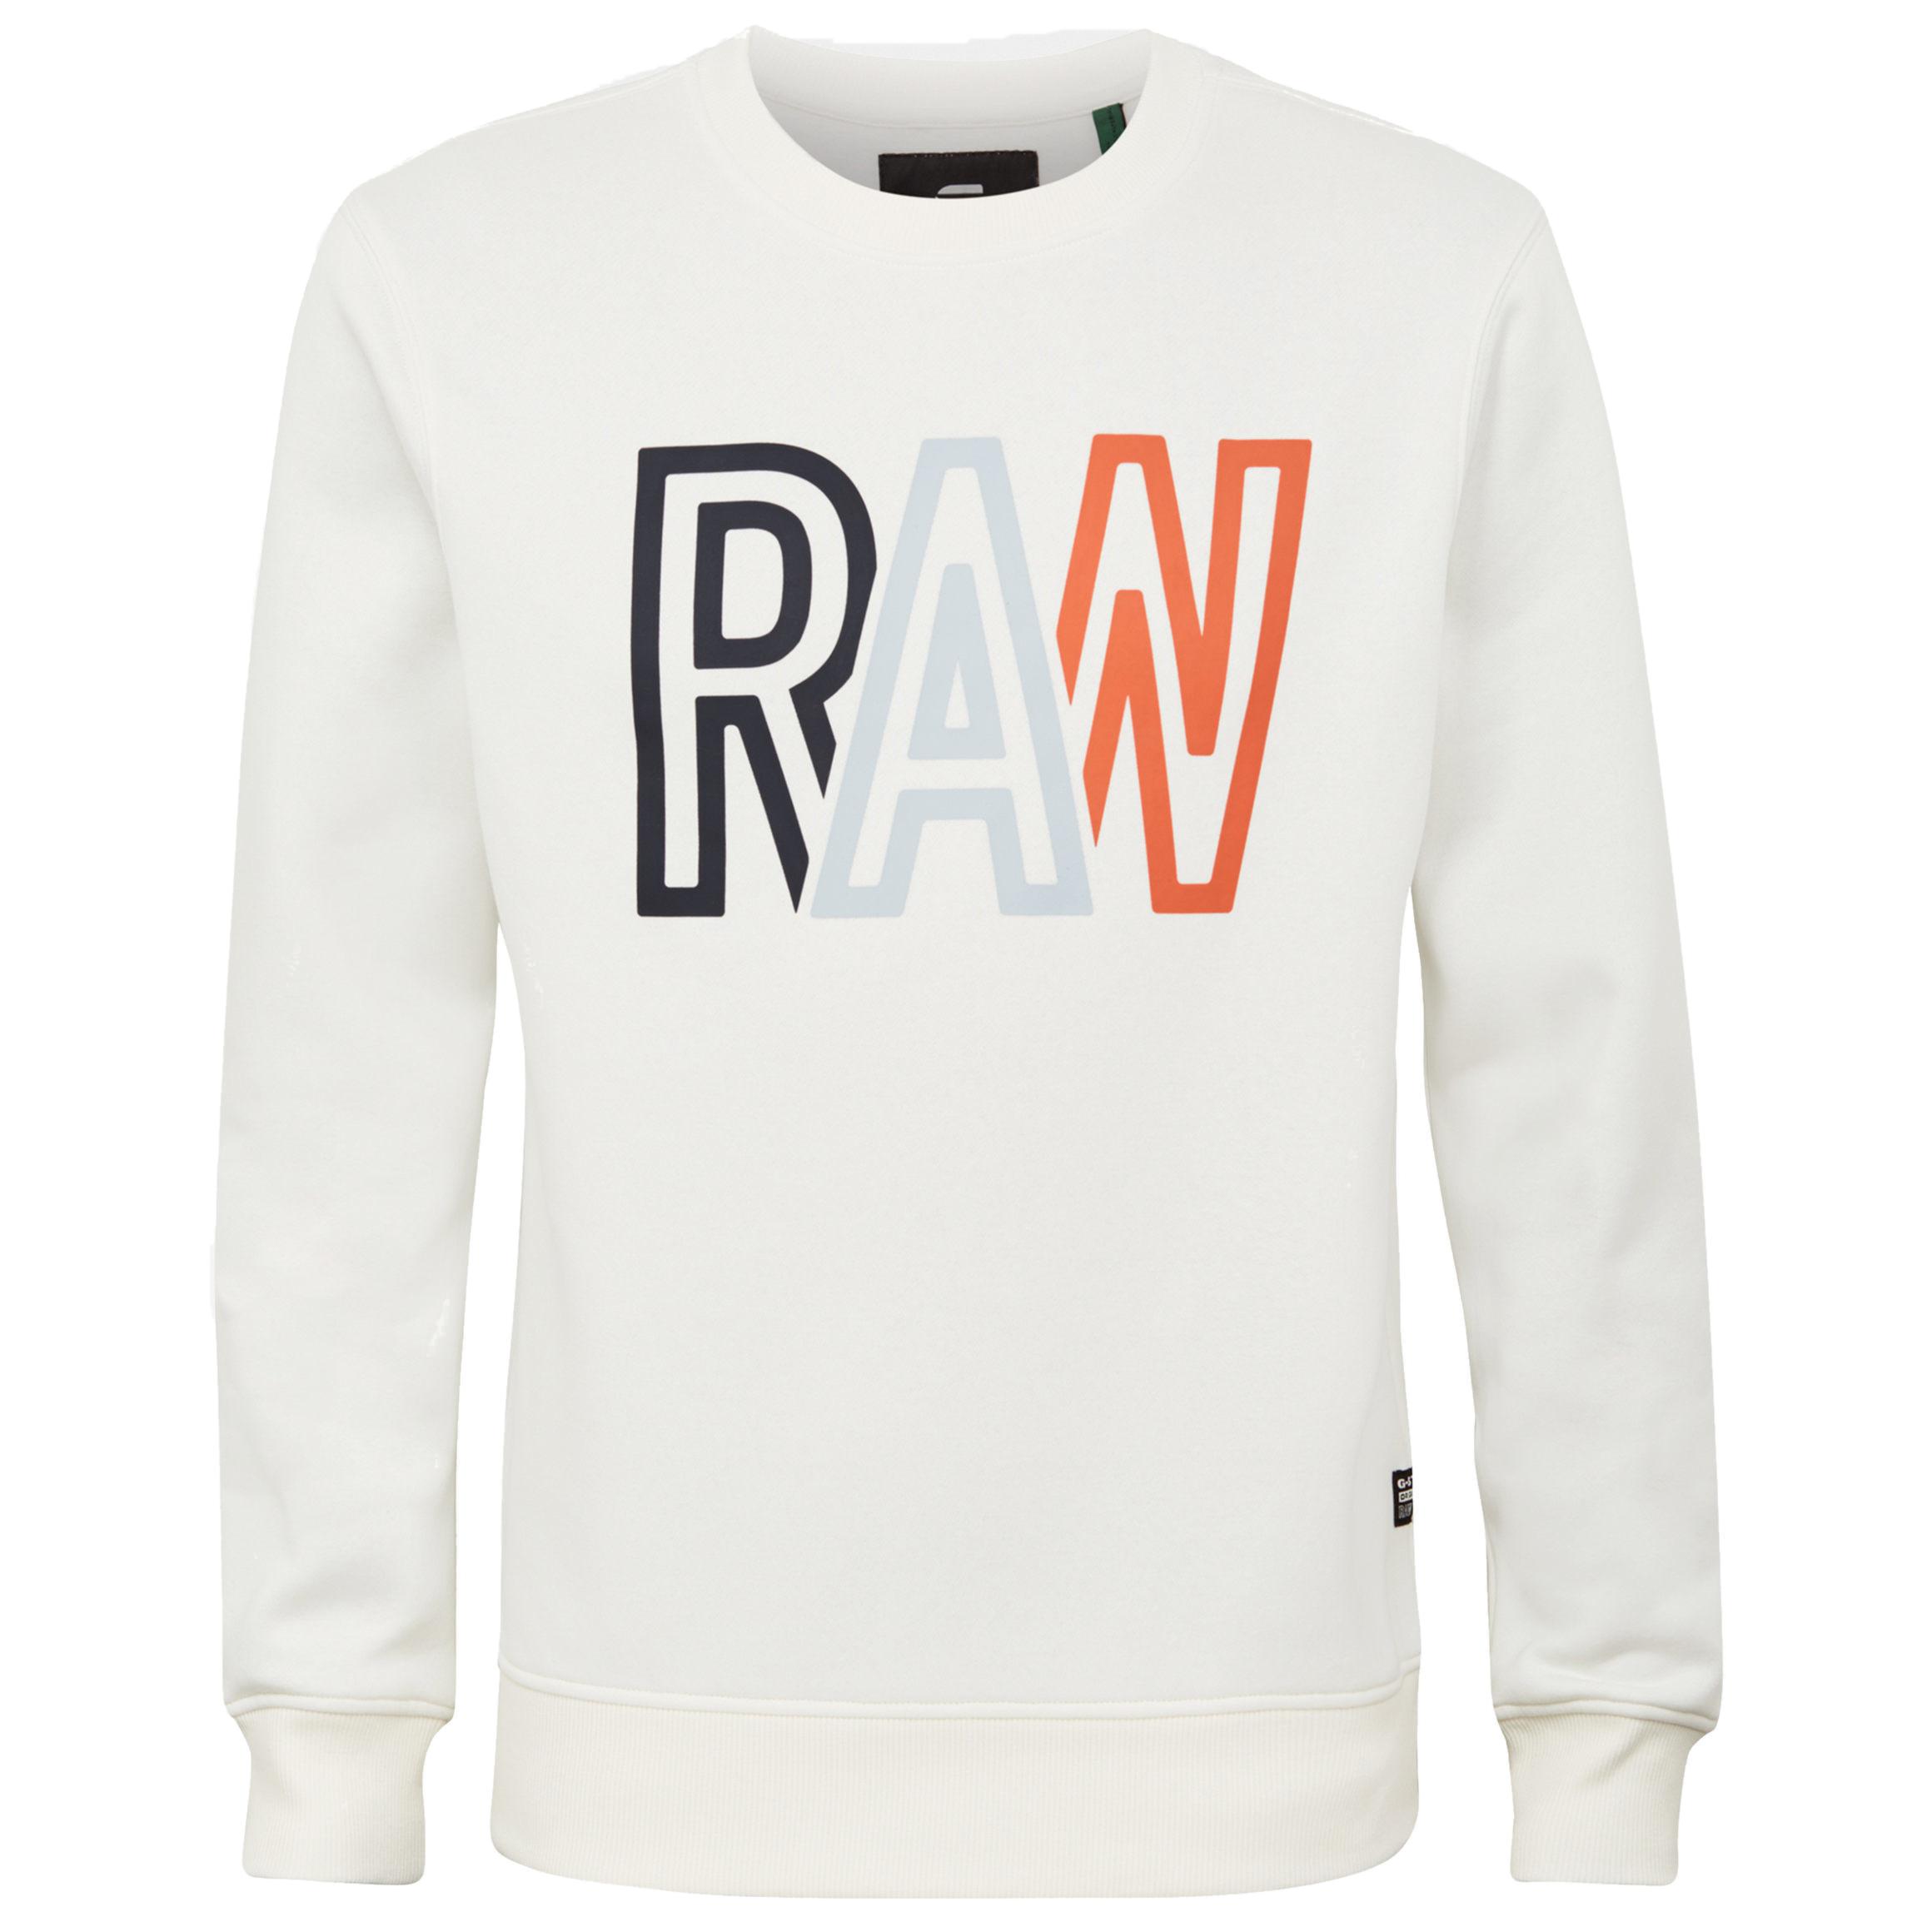 G-STAR RAW Jacquard/_Sweatshirt Sudadera para Hombre